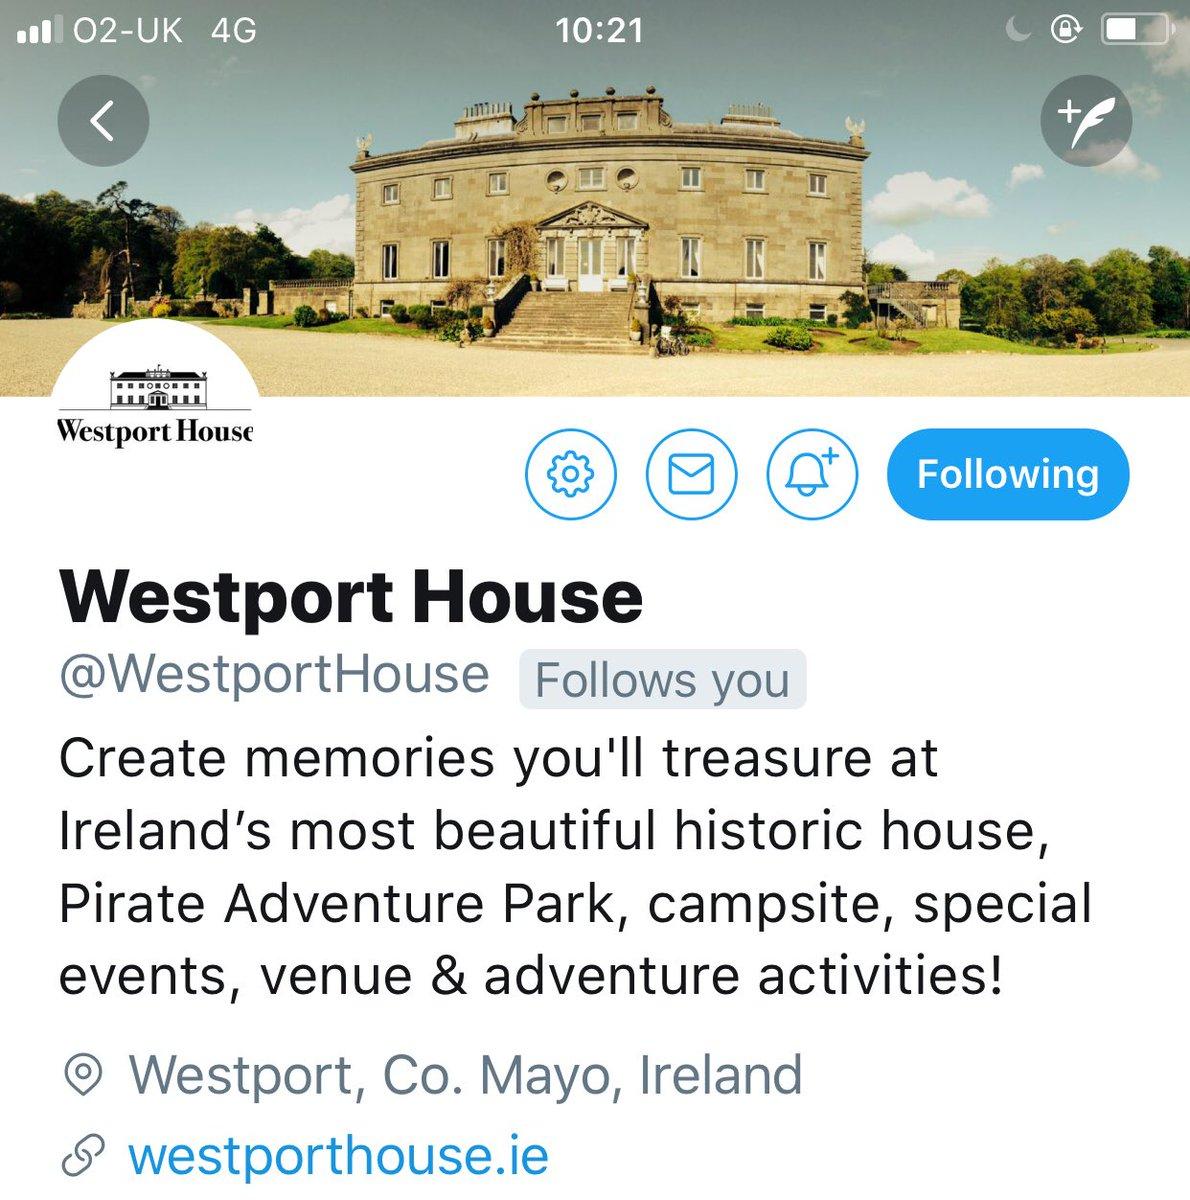 Westport House (@WestportHouse) | Twitter